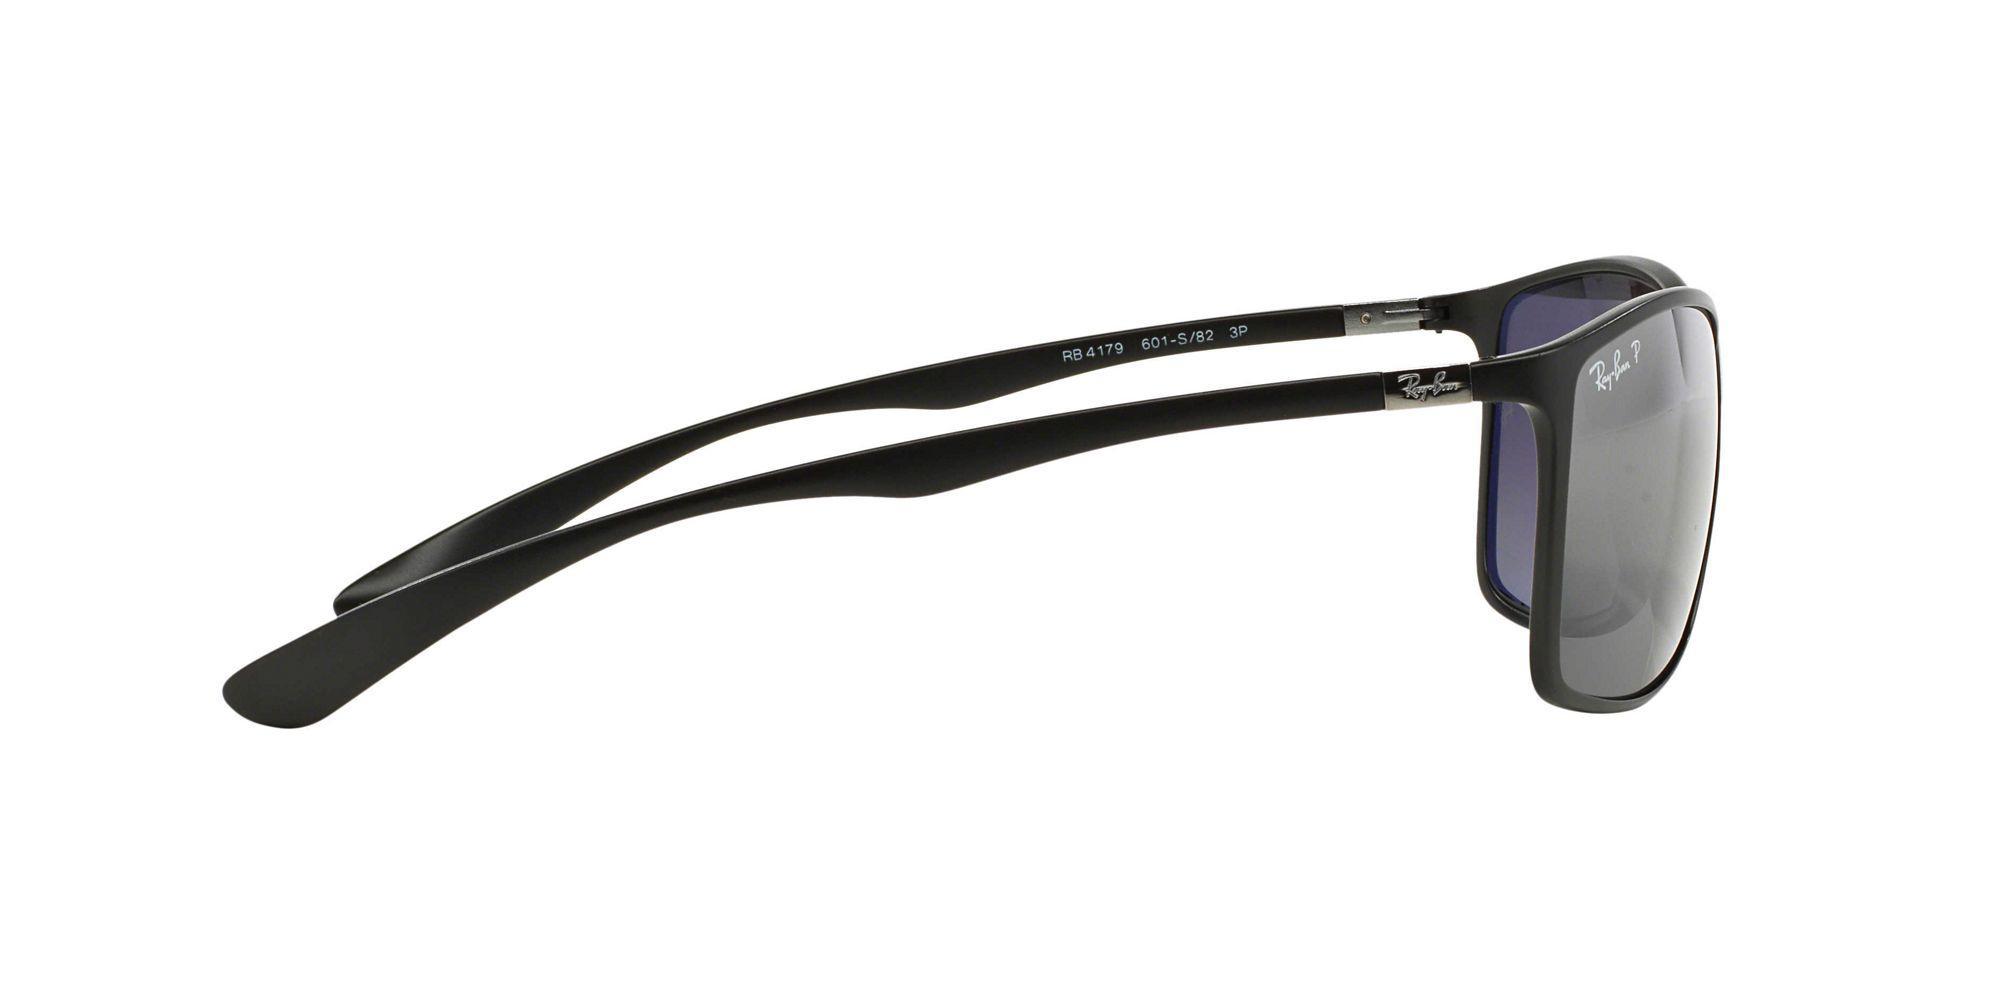 fc1b94b4fb Ray-Ban - Black  liteforce  Rb4179 Sunglasses for Men - Lyst. View  fullscreen